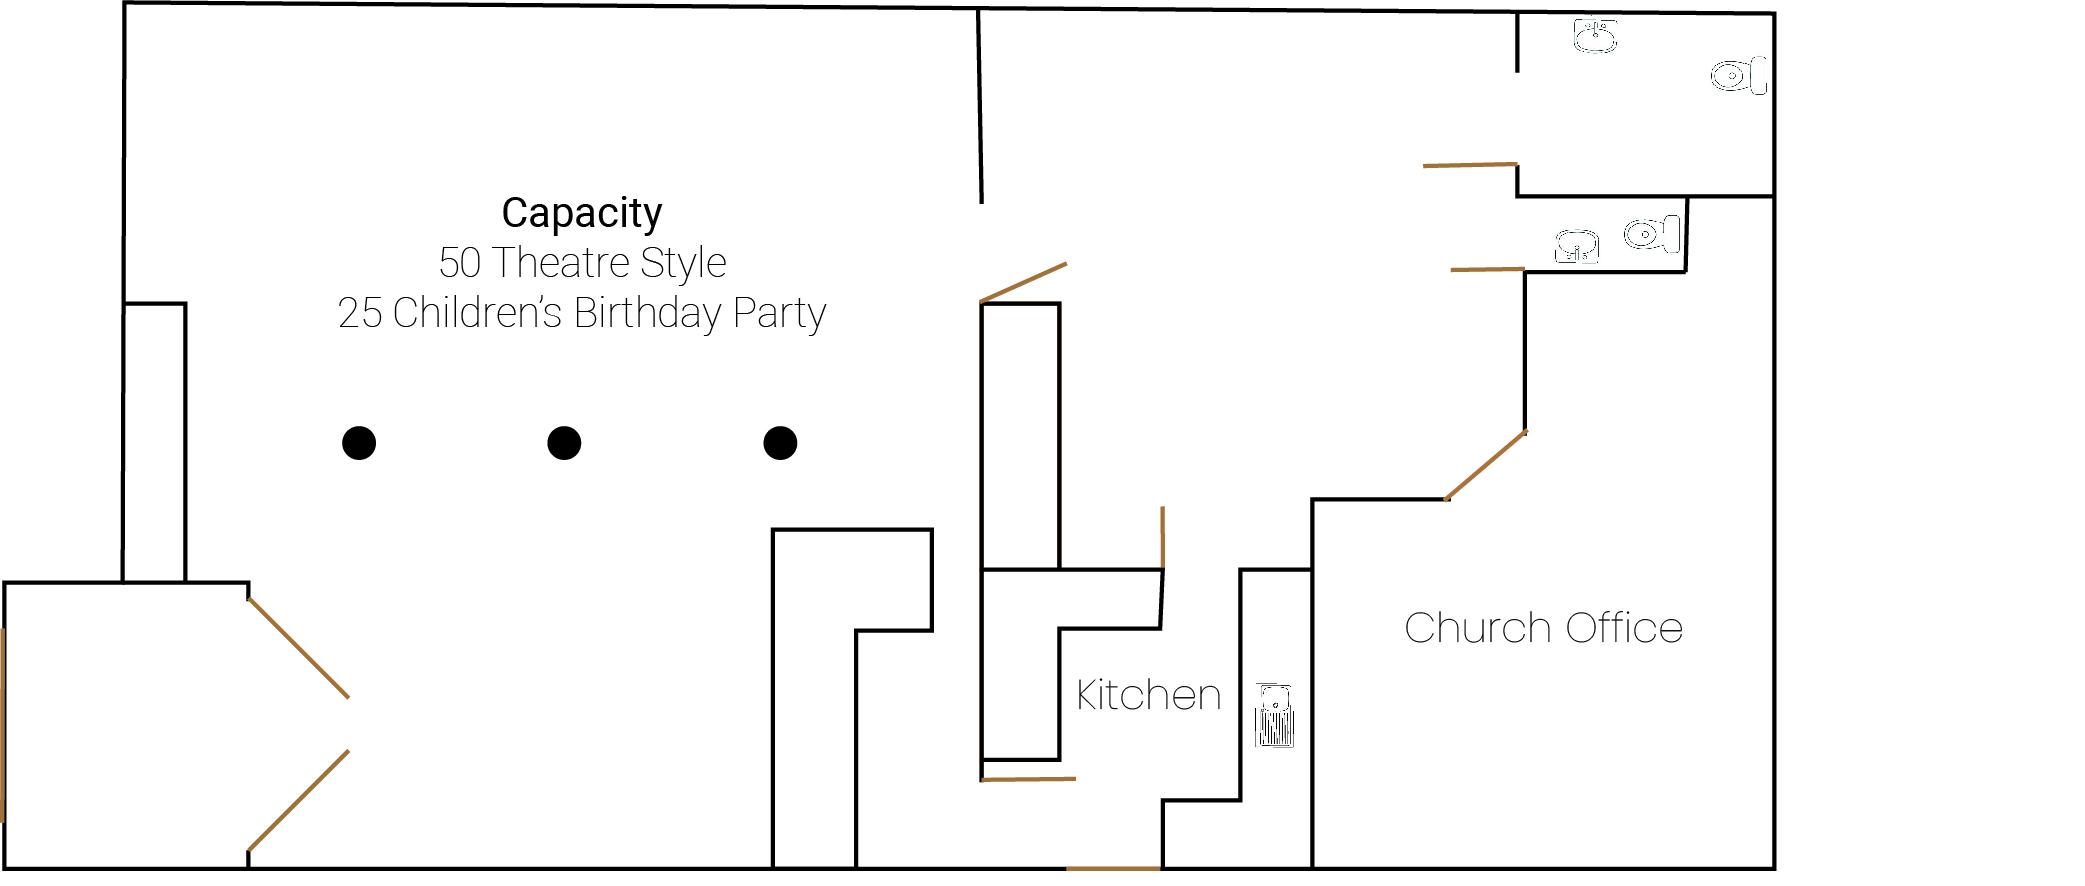 Mission Hall Floor Plan High Res.jpg